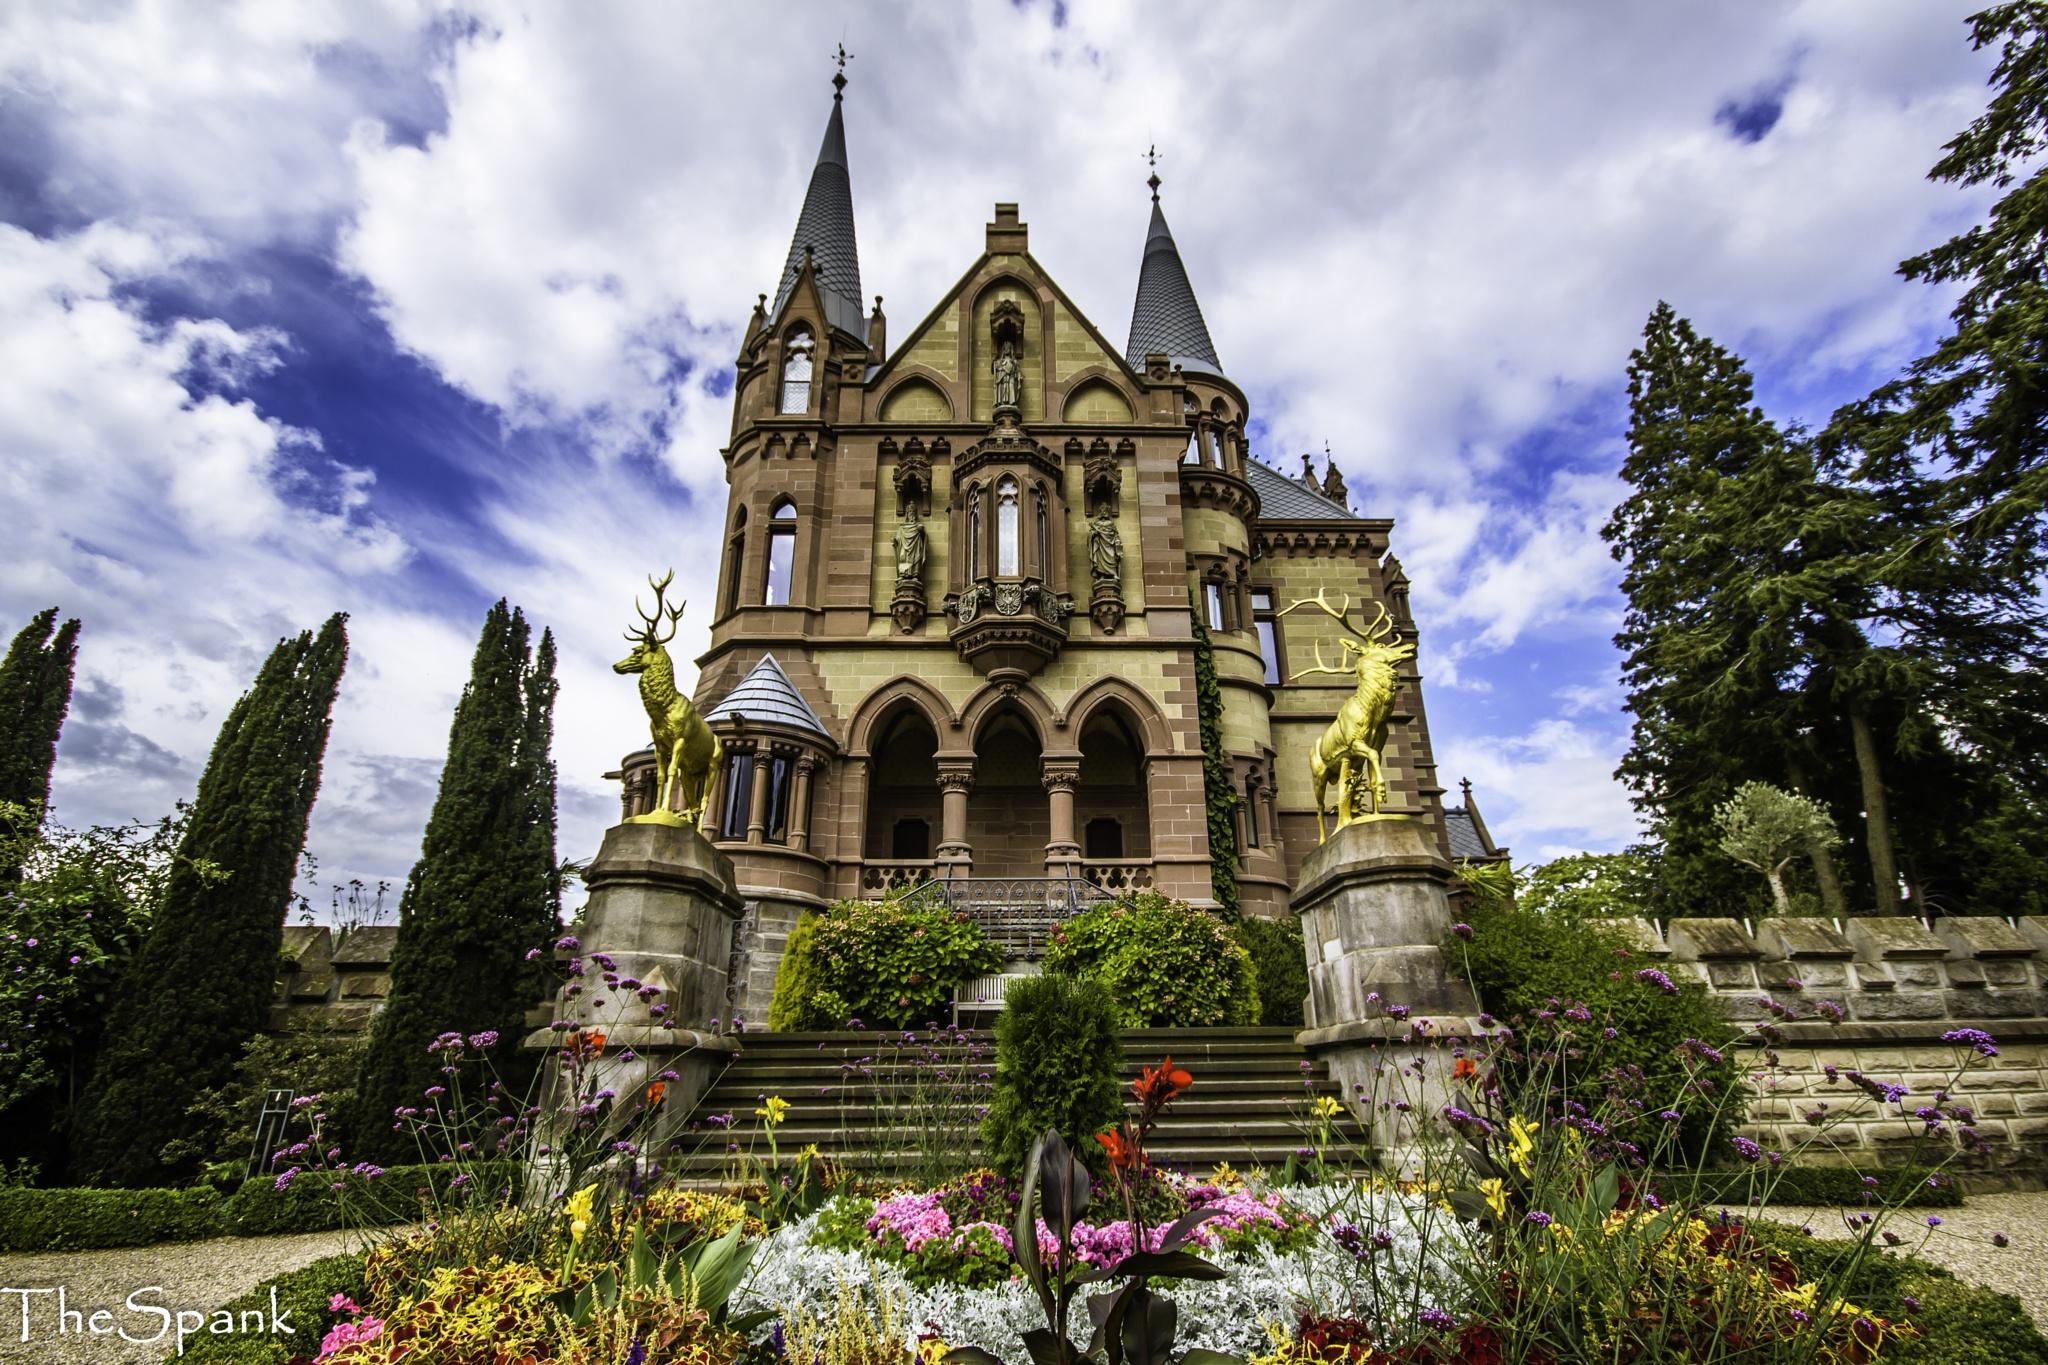 Dragenburg castle by Henk